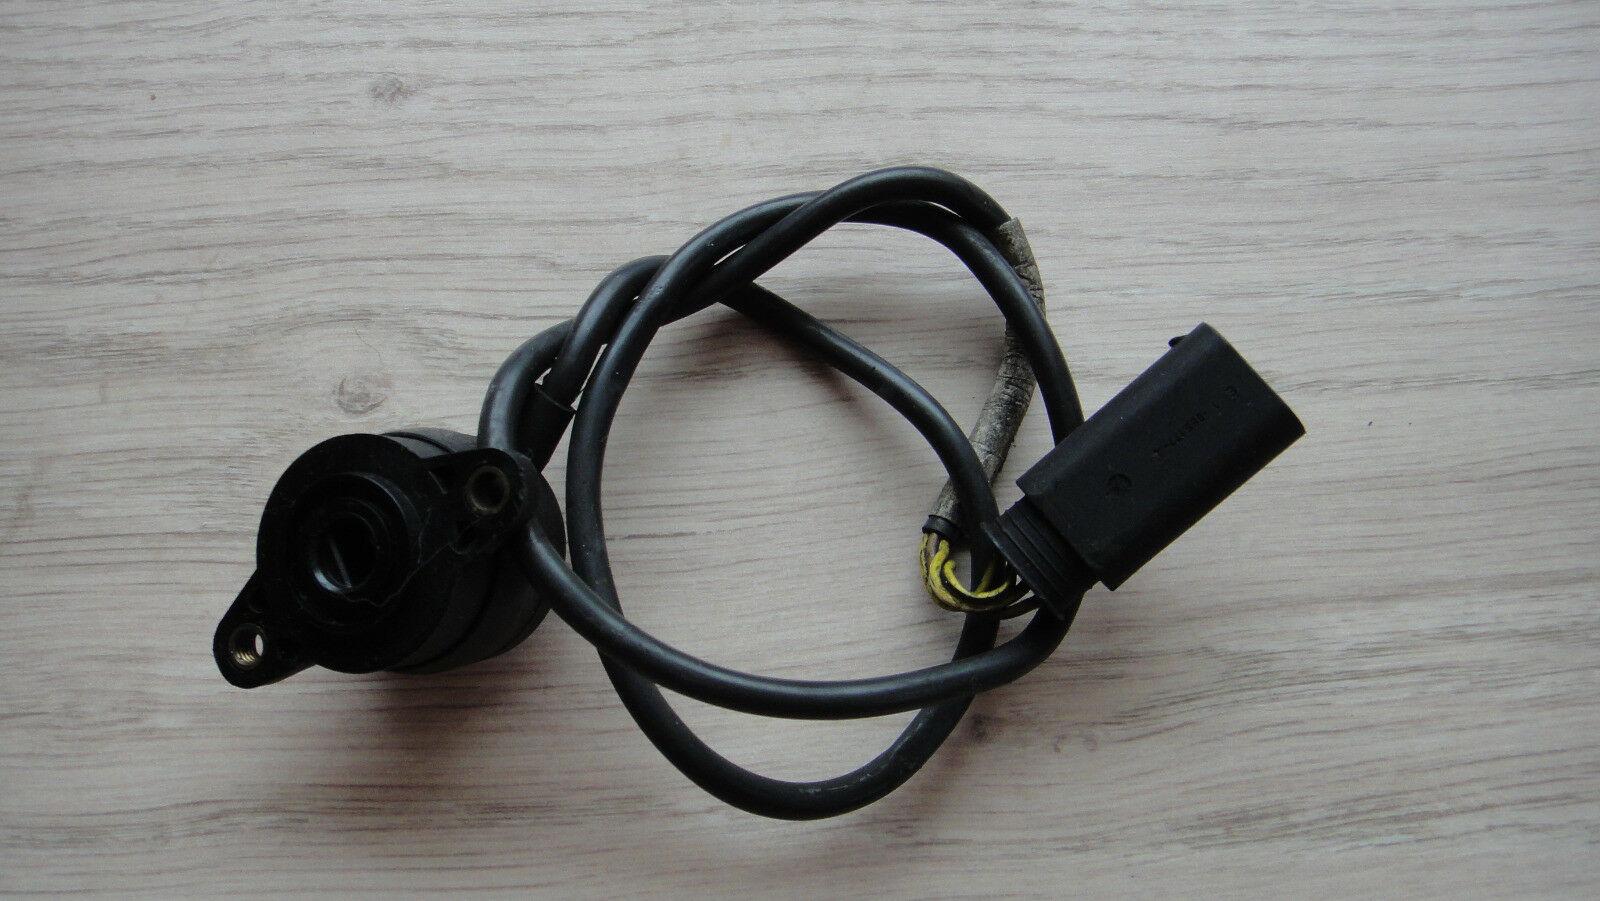 ganganzeige-getriebeschalter-schalter-bmw-r1100gs-r-850-1100-1150.jpg